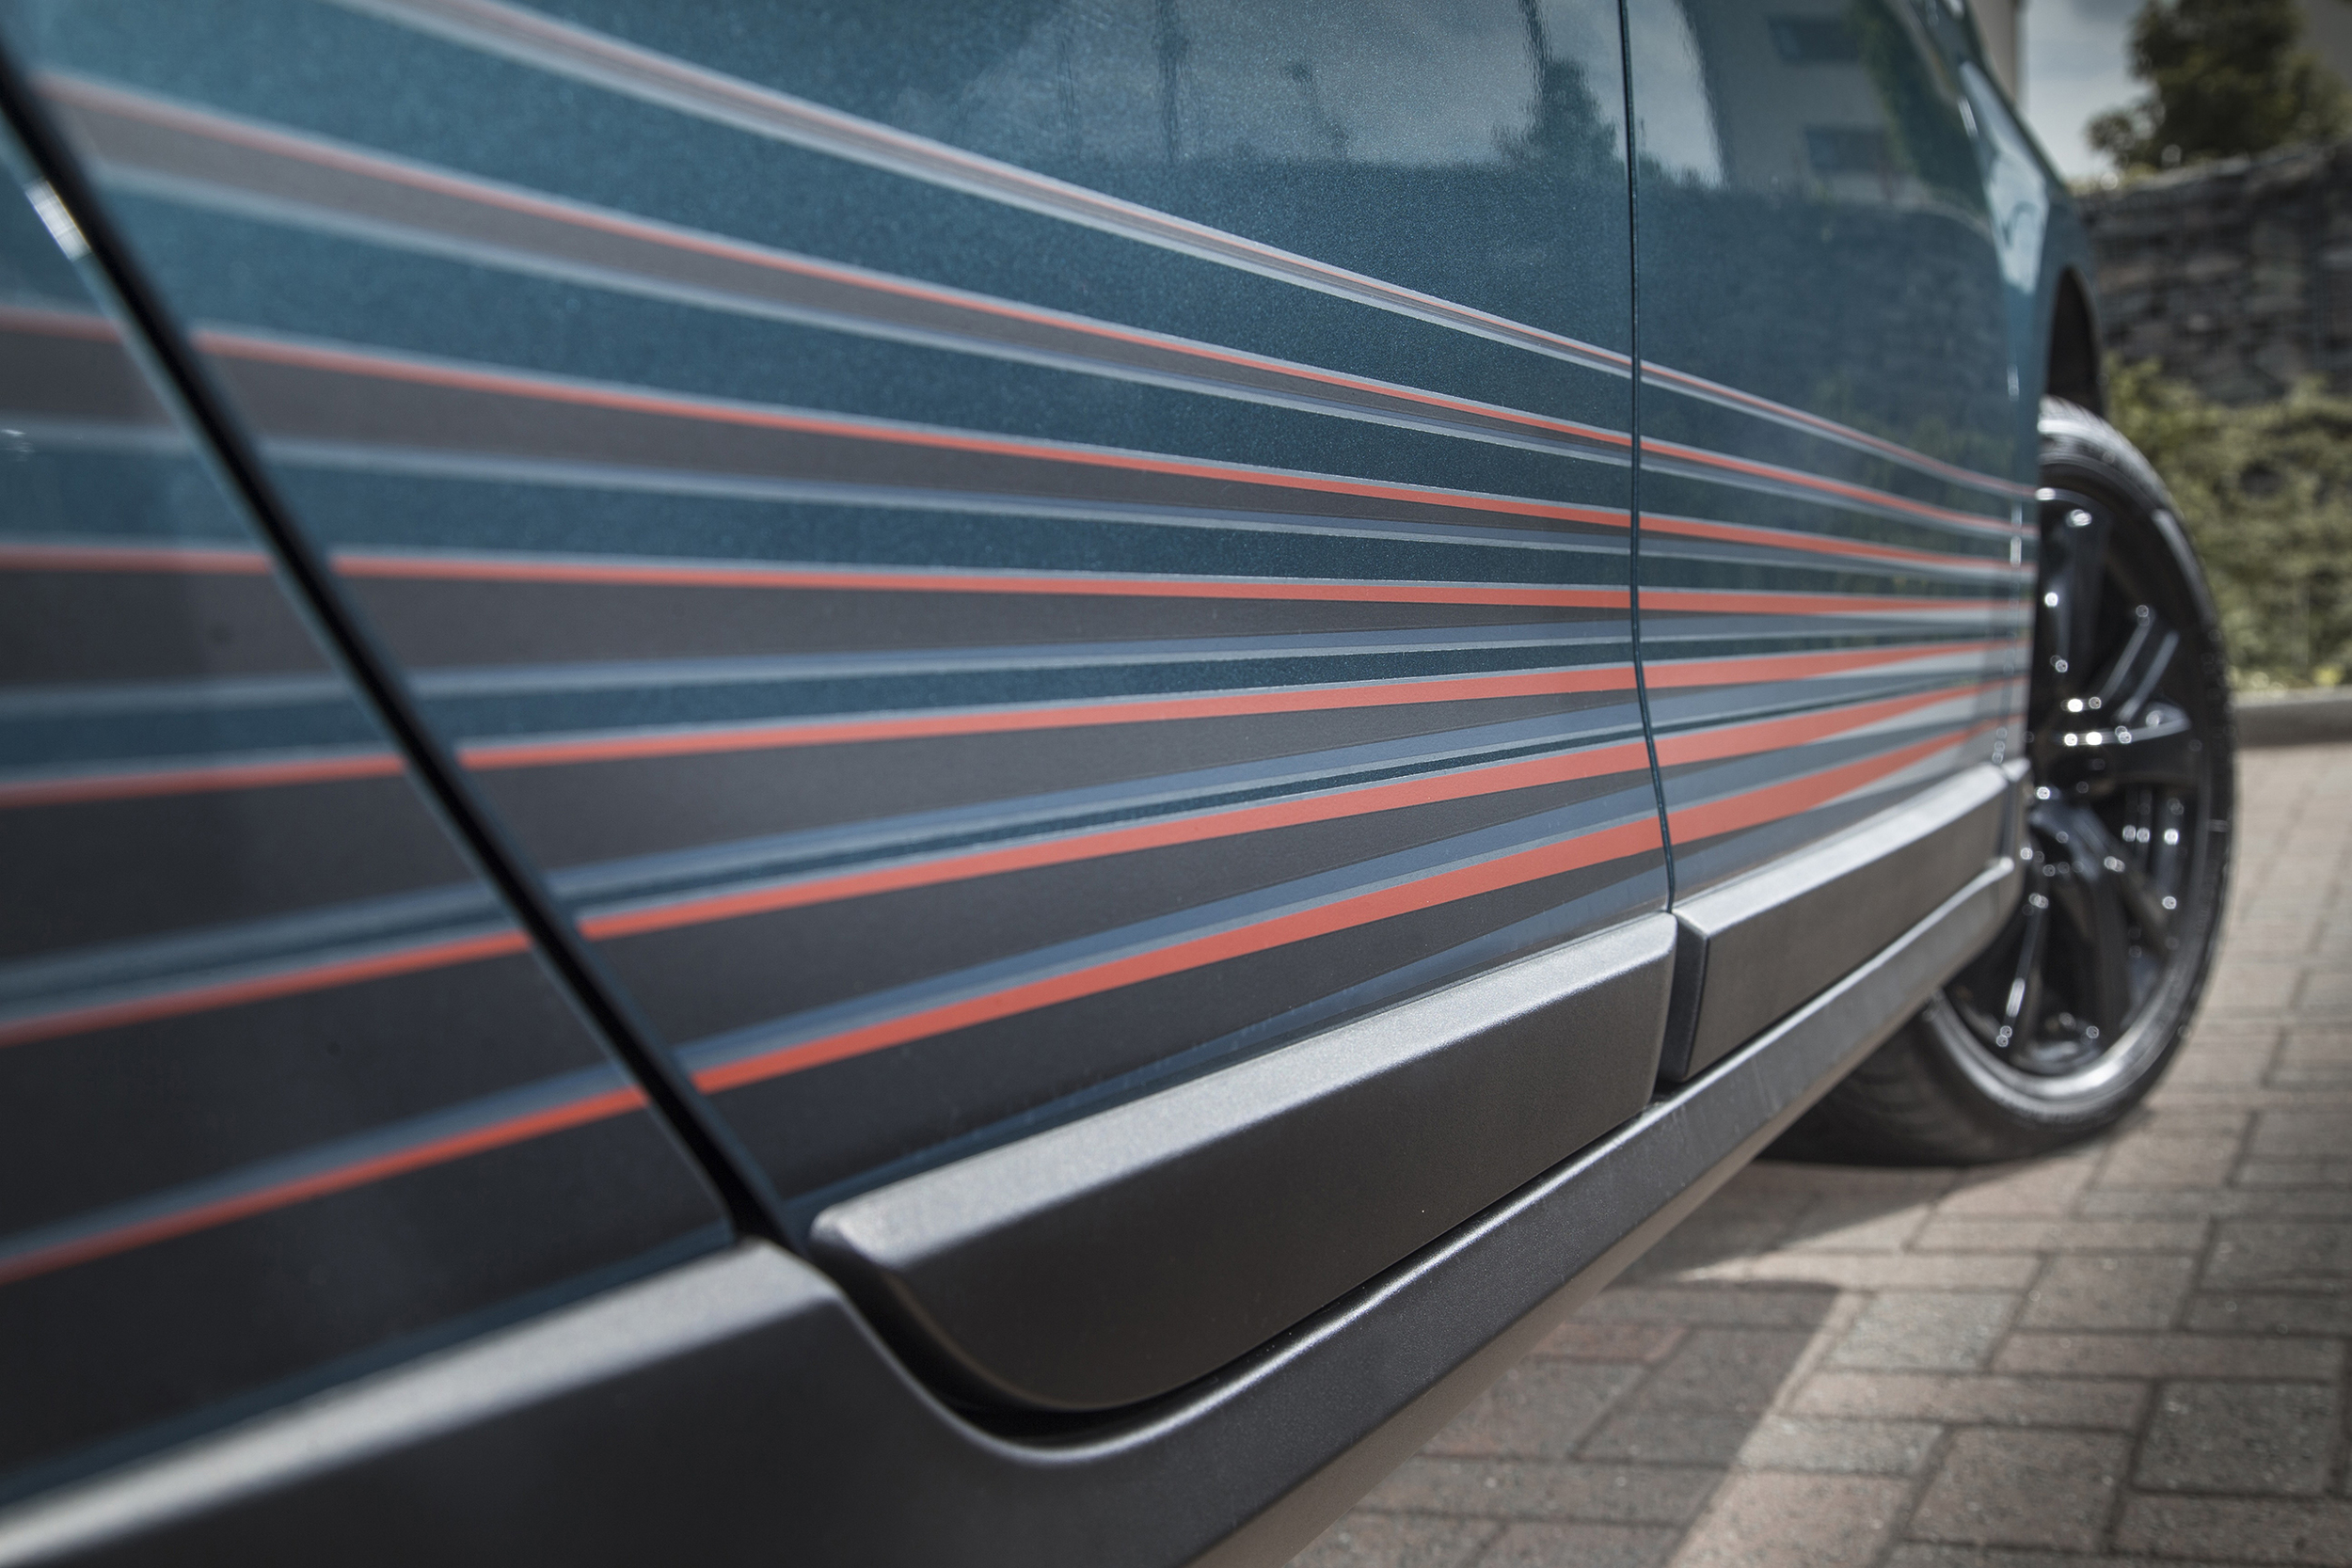 Peugeot reveals new 2008 Urban Cross edition